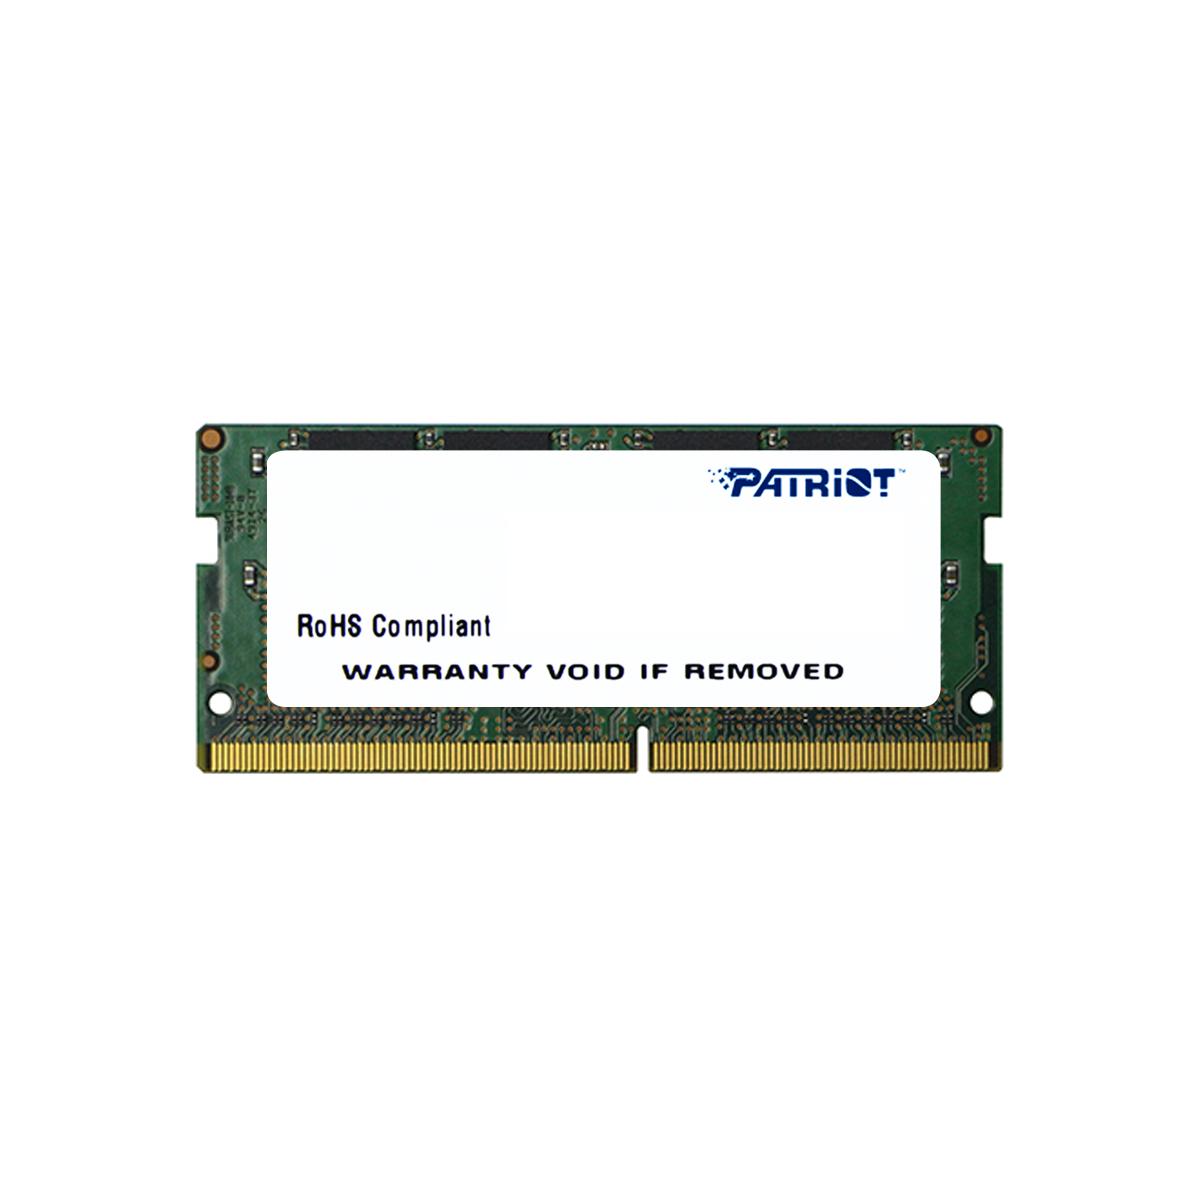 Patriot Signature Line 4GB 2133MHz DDR4 CL15 SODIMM